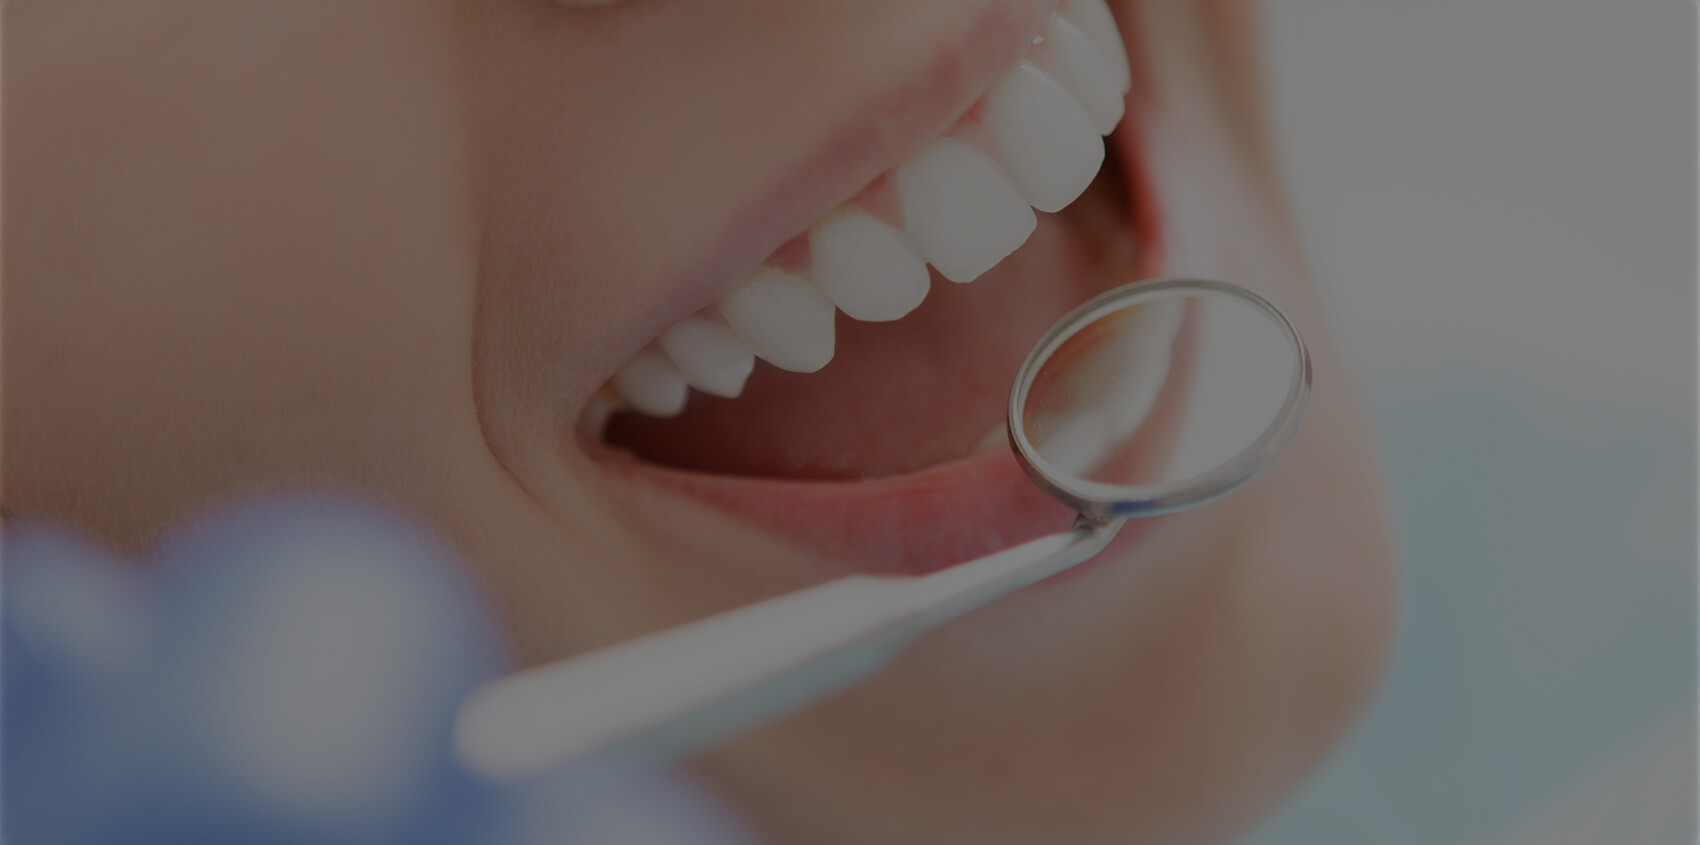 A Simple Dental Sealant Procedure Can Save Salt Lake City, UT, Residents' Teeth